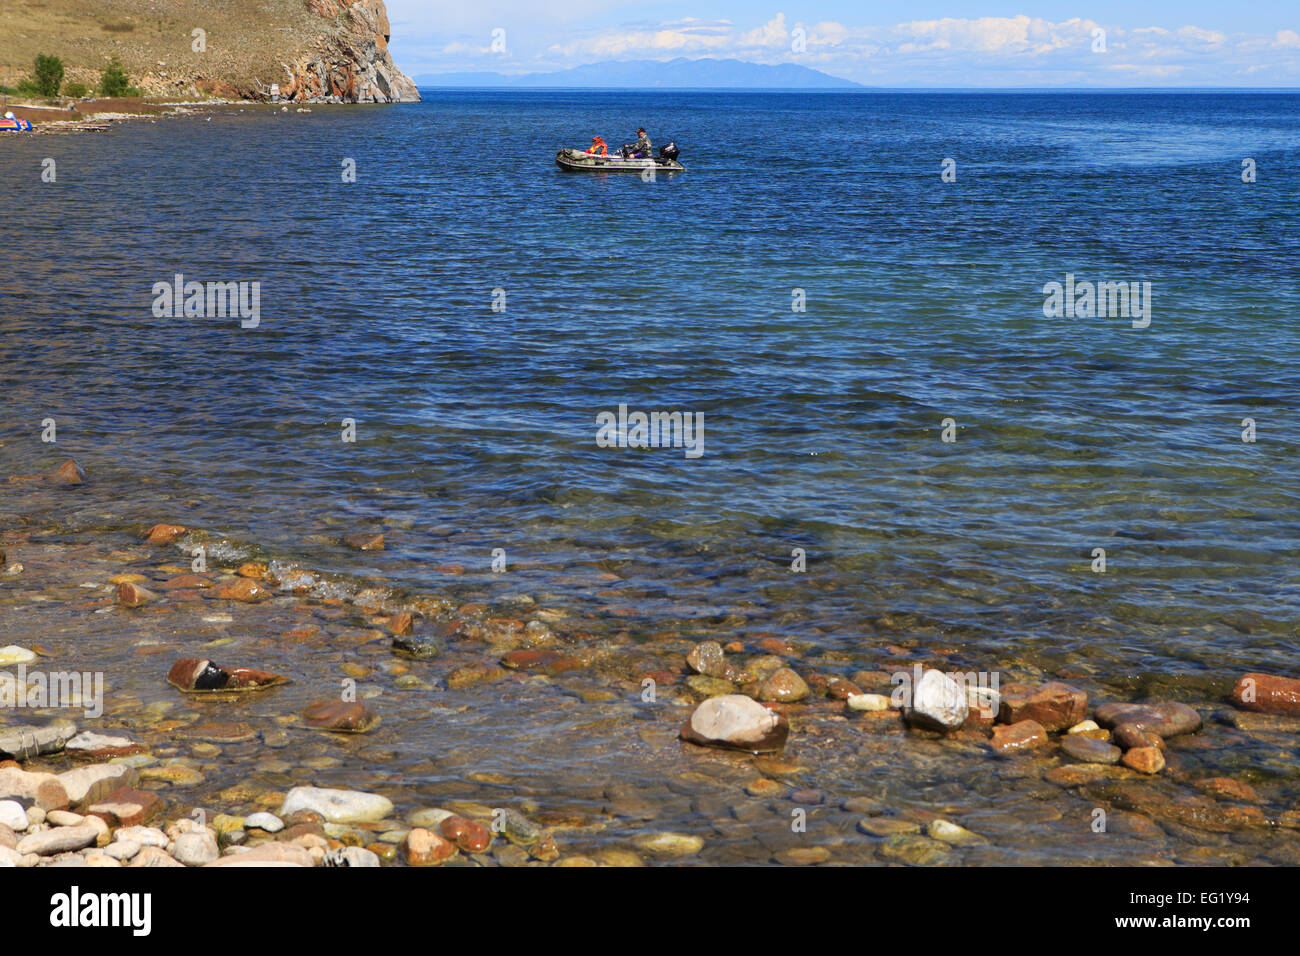 Olkhon island, Ugury, Baikal lake, Russia - Stock Image